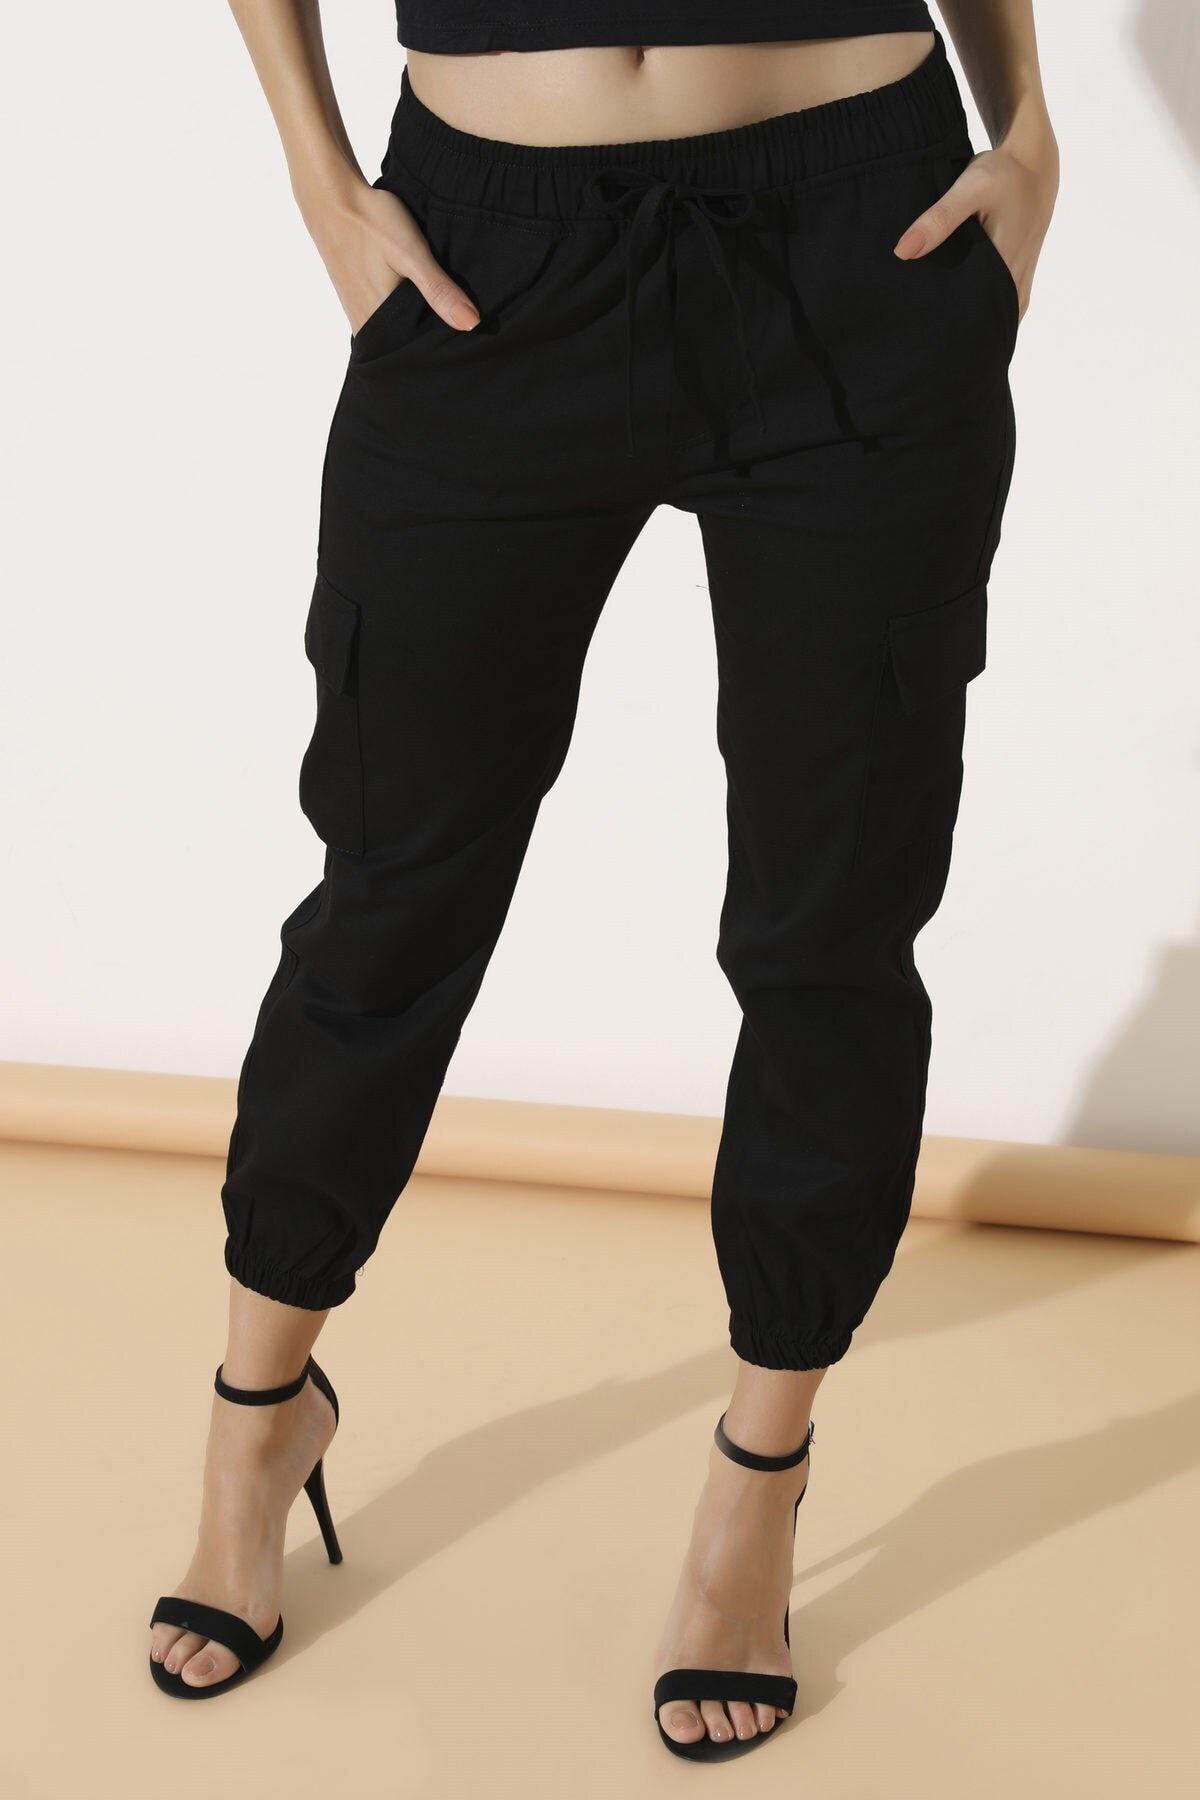 Arma Life Kadın Siyah Kargo Cep Pantolon 2